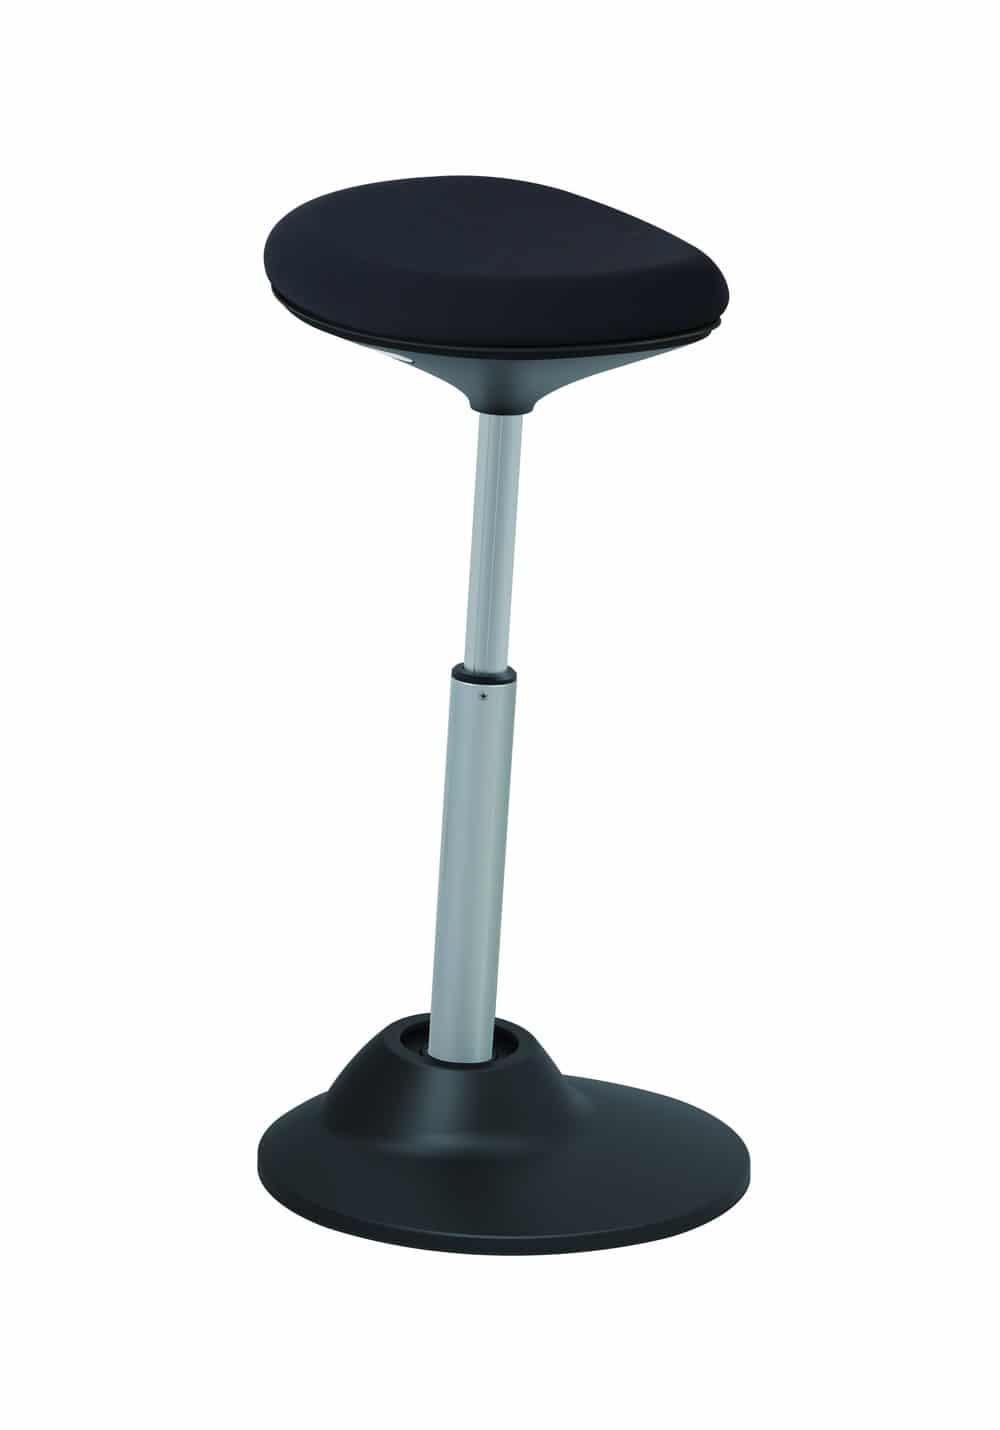 Ergonomic seating Chair